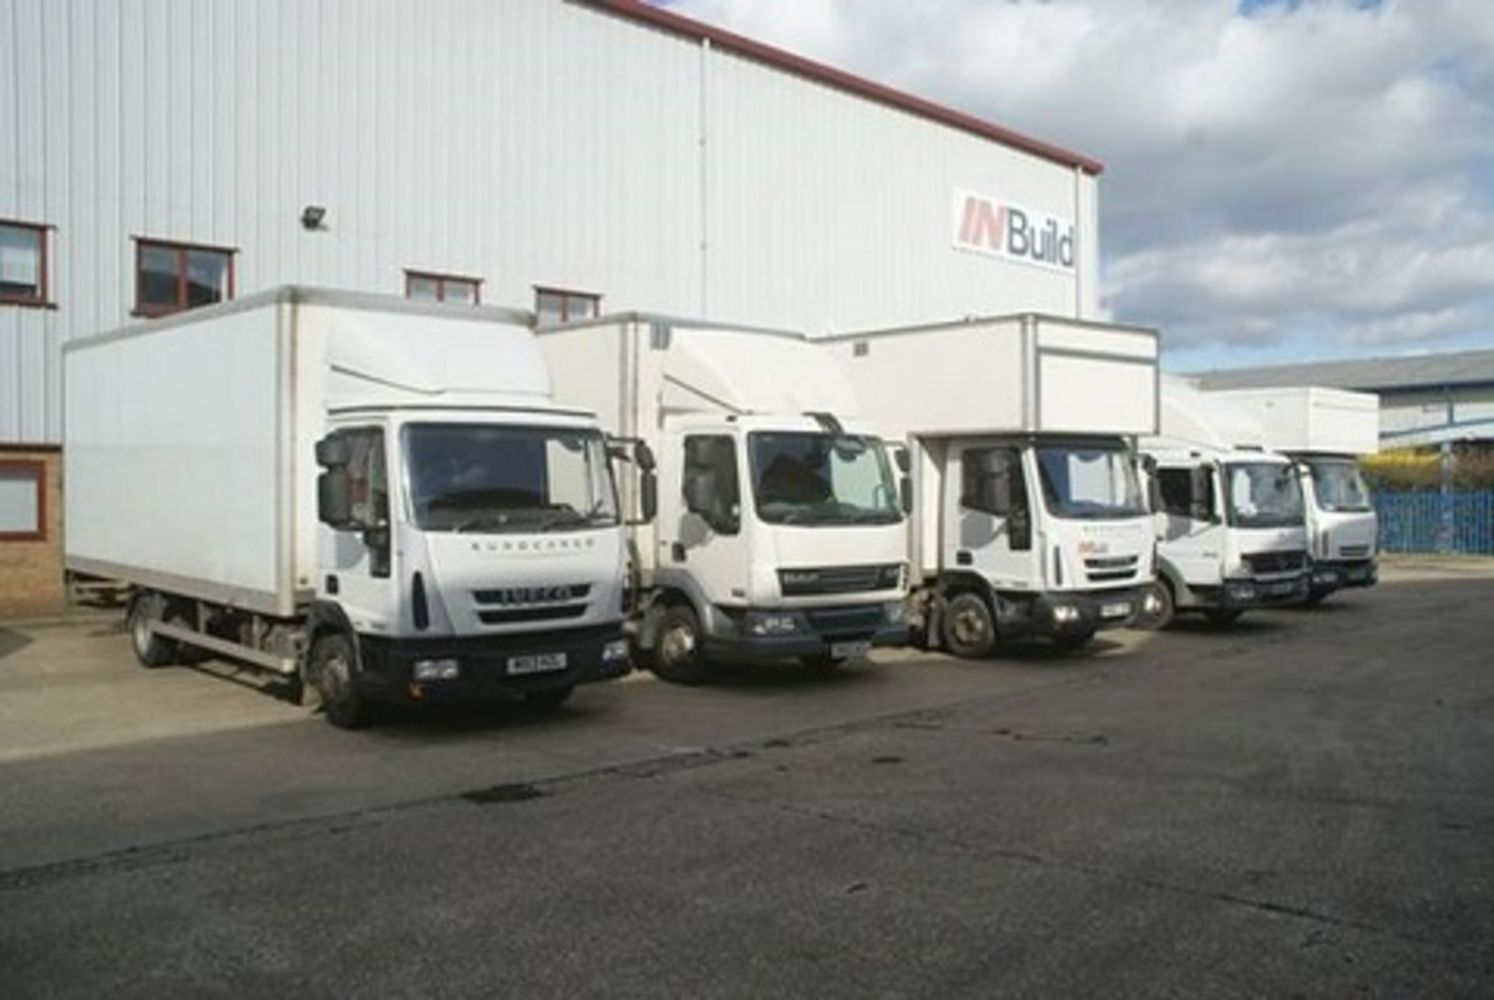 InBuild Solutions Ltd